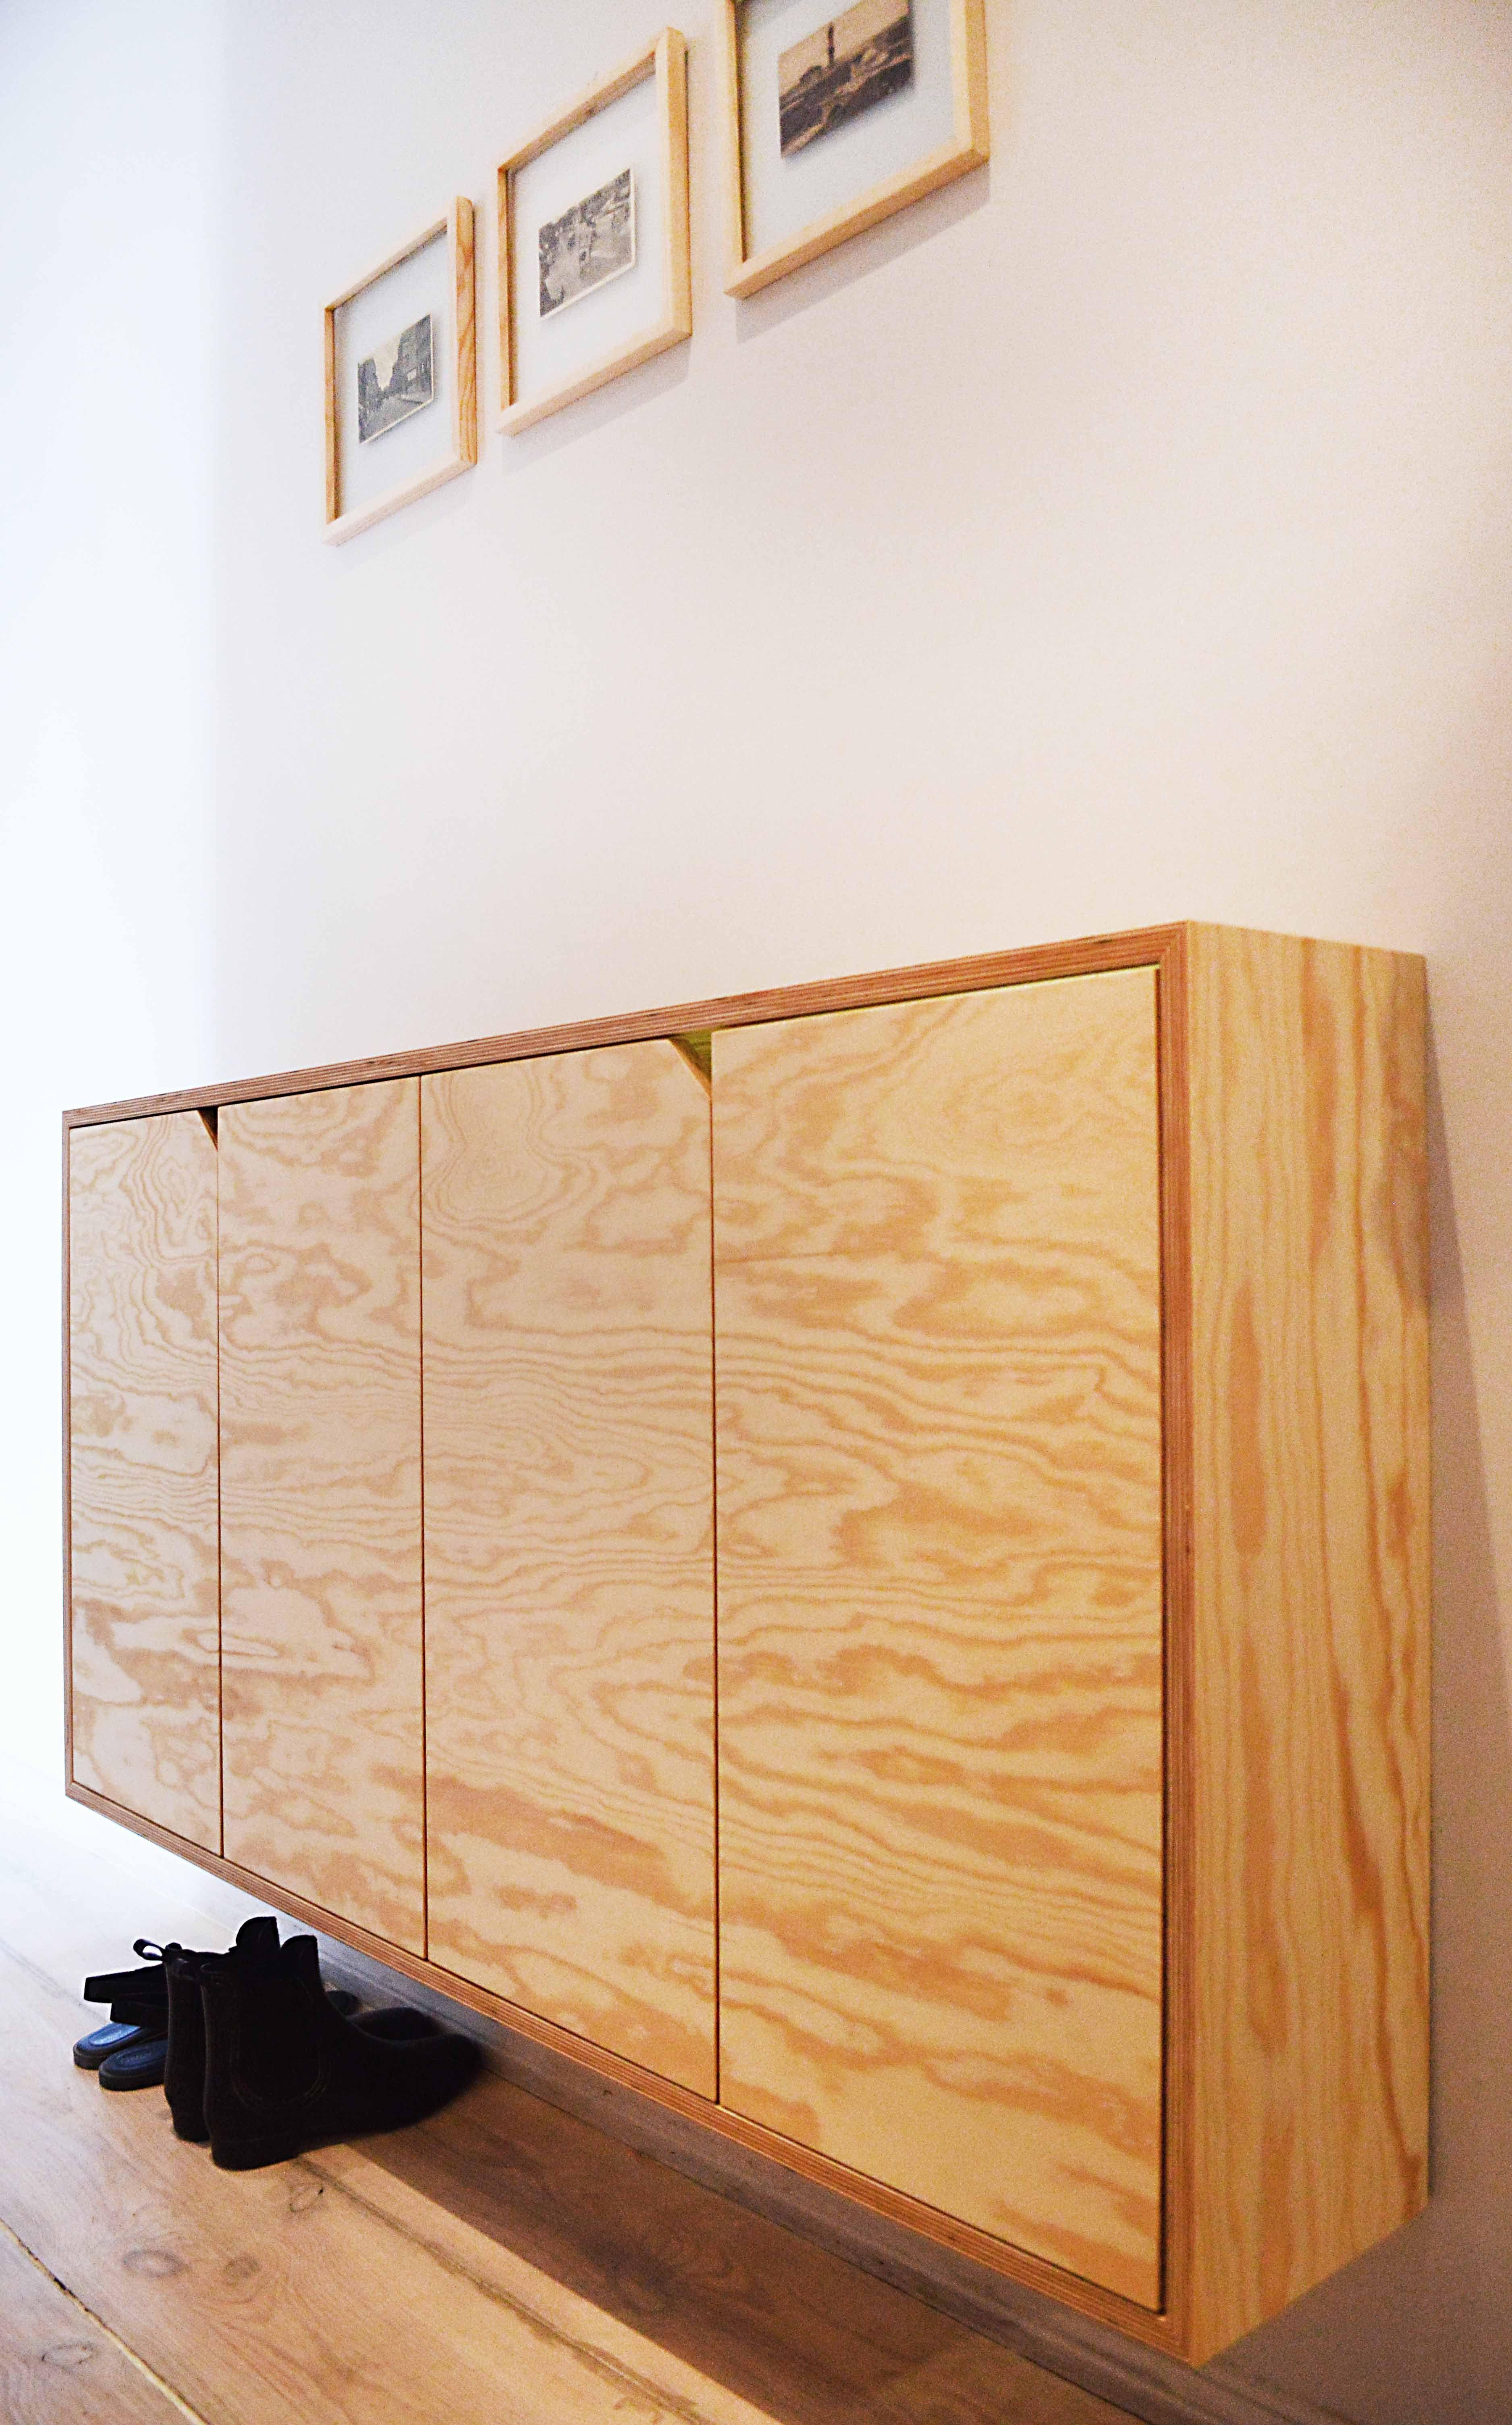 Material f r stehtisch seekiefer pain wood plywood for Sideboard untergestell